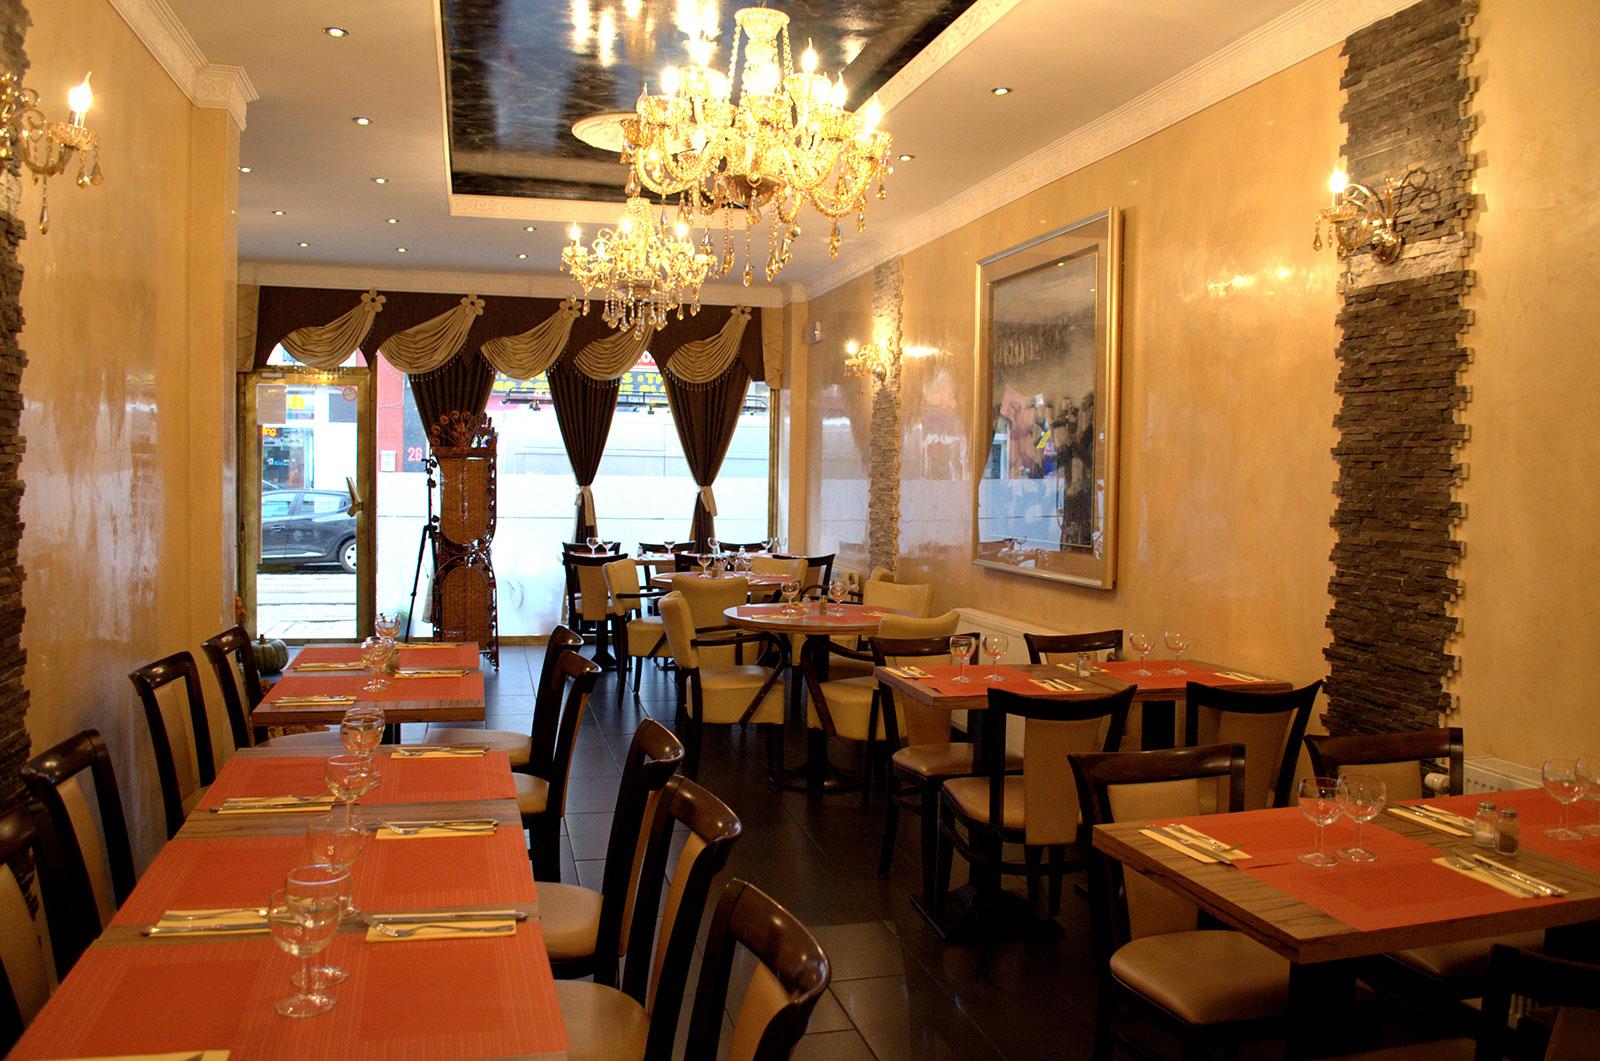 restaurant-slider-2 - Livraison de poissons • Poissonnerie • Restaurant • Traiteur à Anderlecht